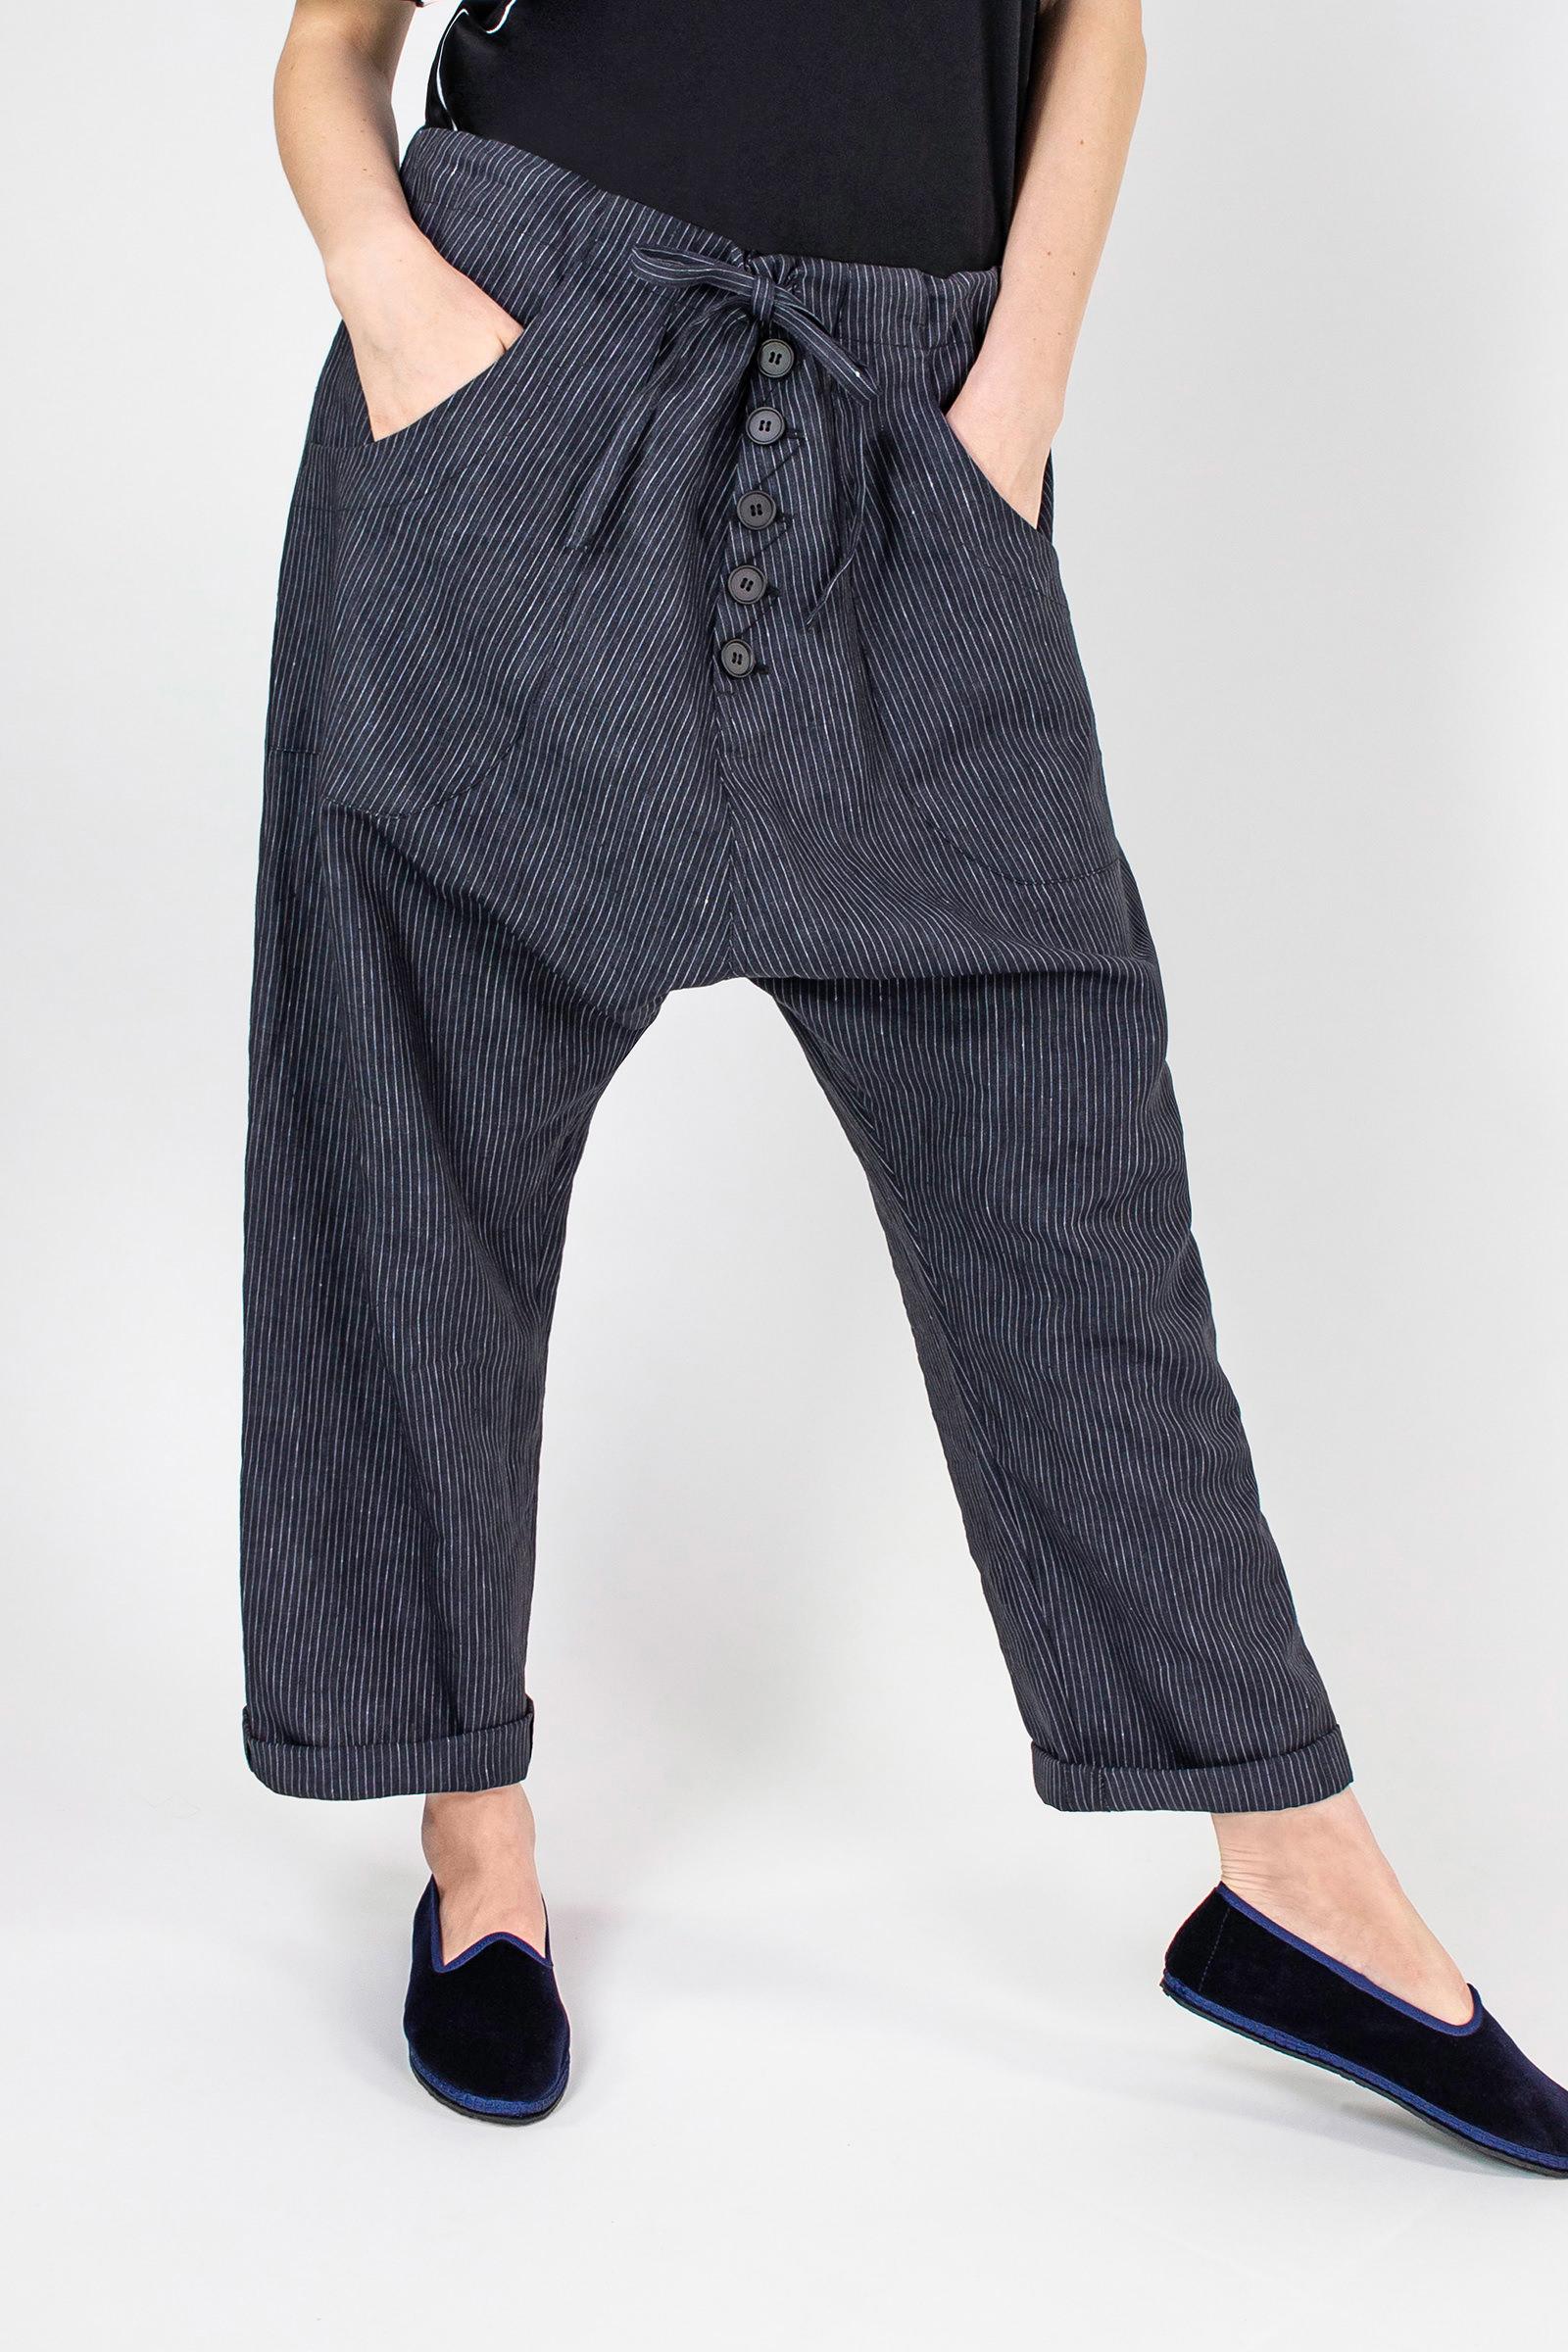 Ellisse Trousers Img 7316b